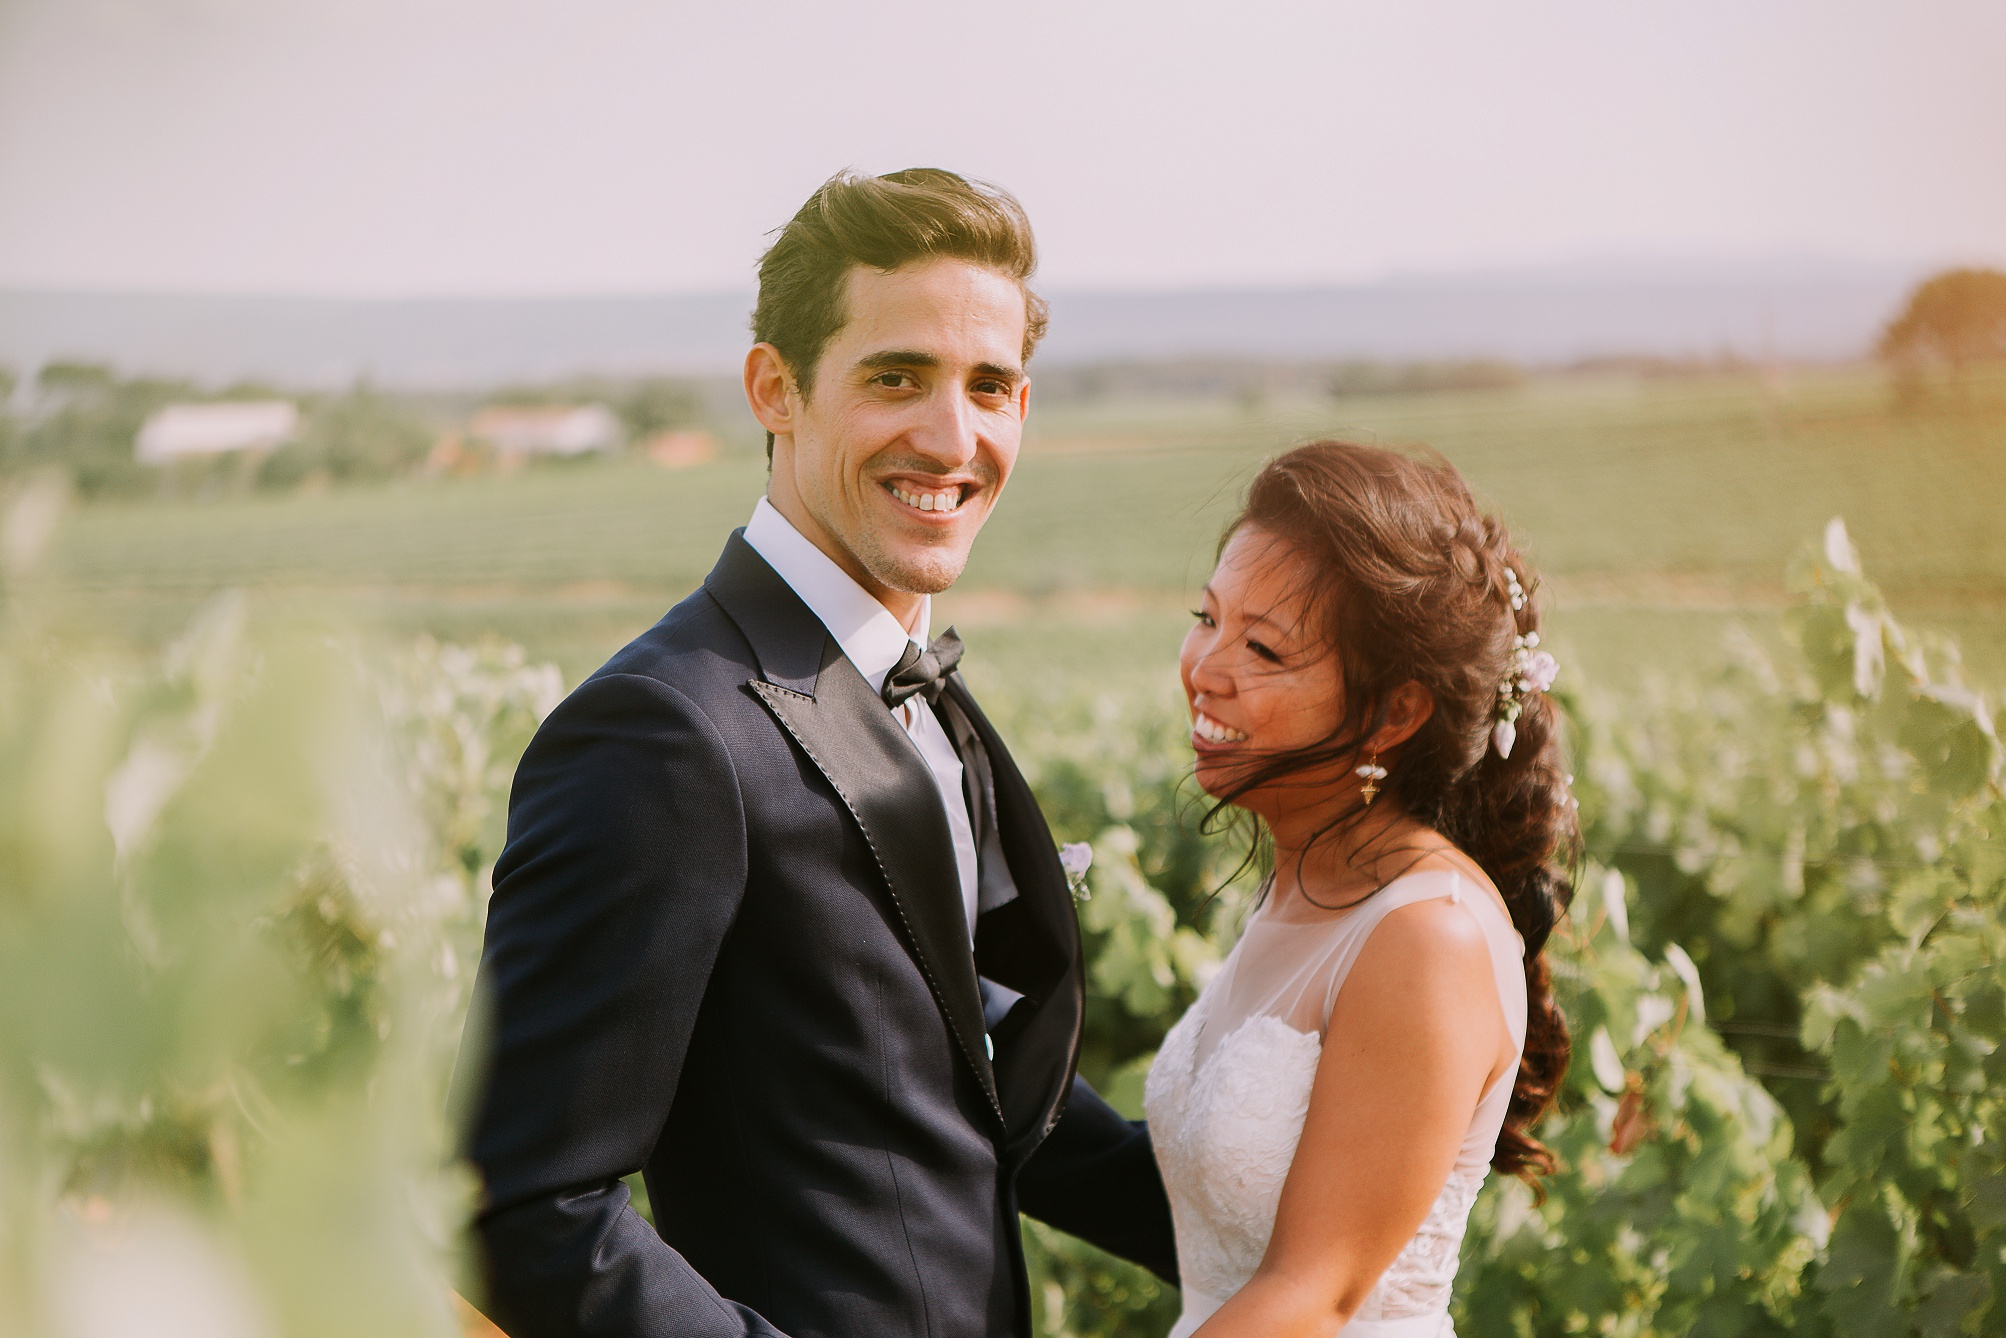 katerynaphotos-mariage-photographe-puyloubier-provence-aix-en-provence-sud-de-la-france_0402.jpg